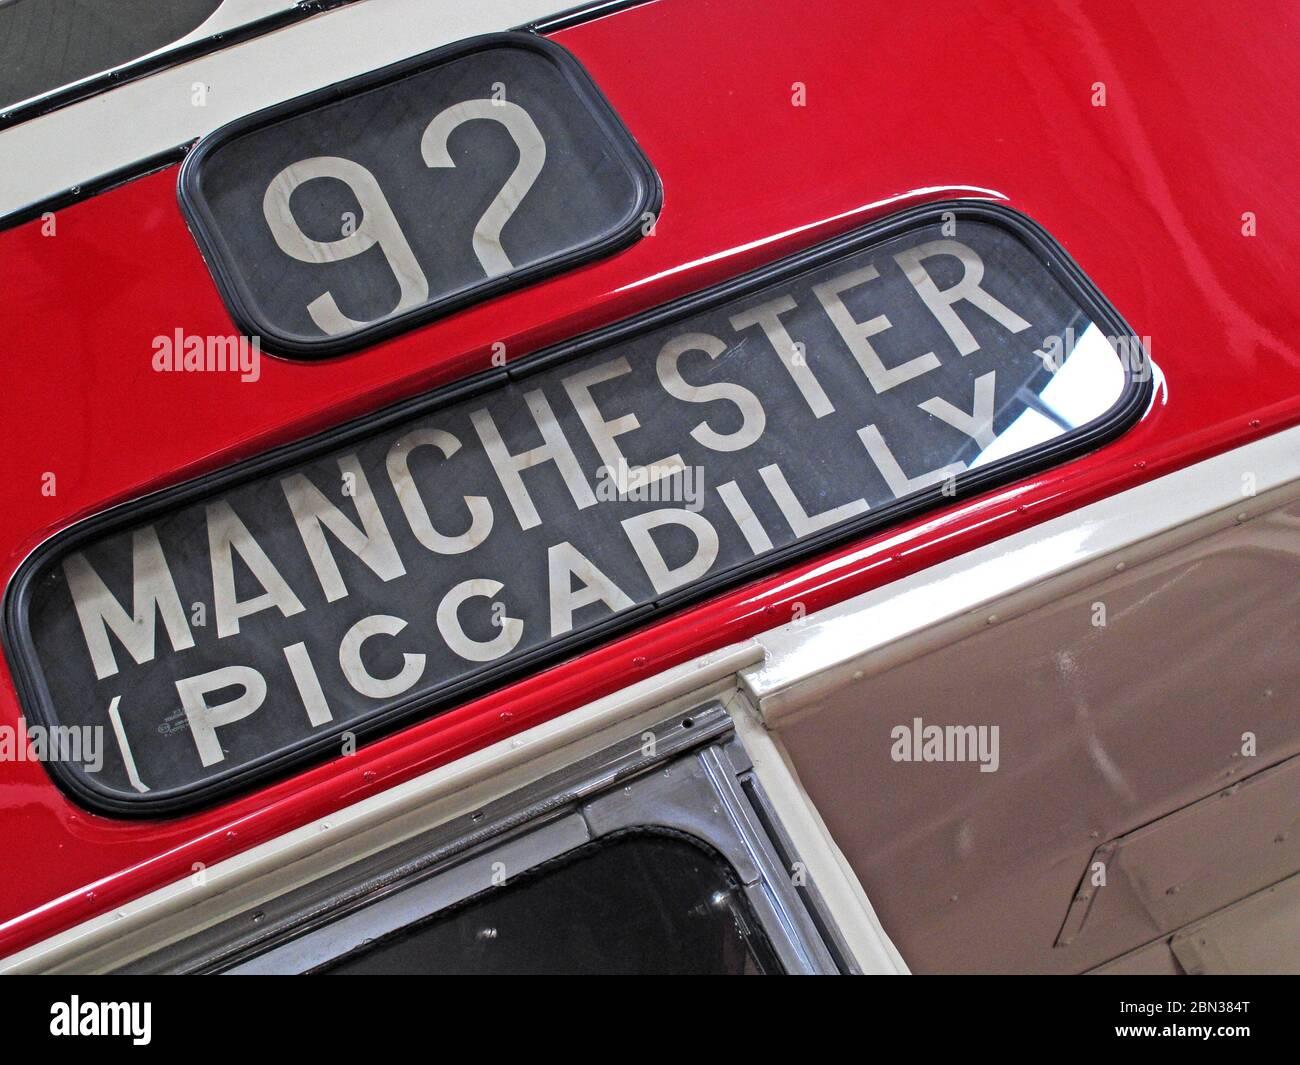 GoTonySmith,Hotpixuk,@Hotpixuk,1950,North West England,historic,UK,city,Manchester,Lancashire,buses,bus,omnibus,England,history,transport,Lancs,1950s,92,route,bury,92 bury bus,red bus,red,bury red,number 92,92 bus,Greater Manchester,Piccadilly Gardens